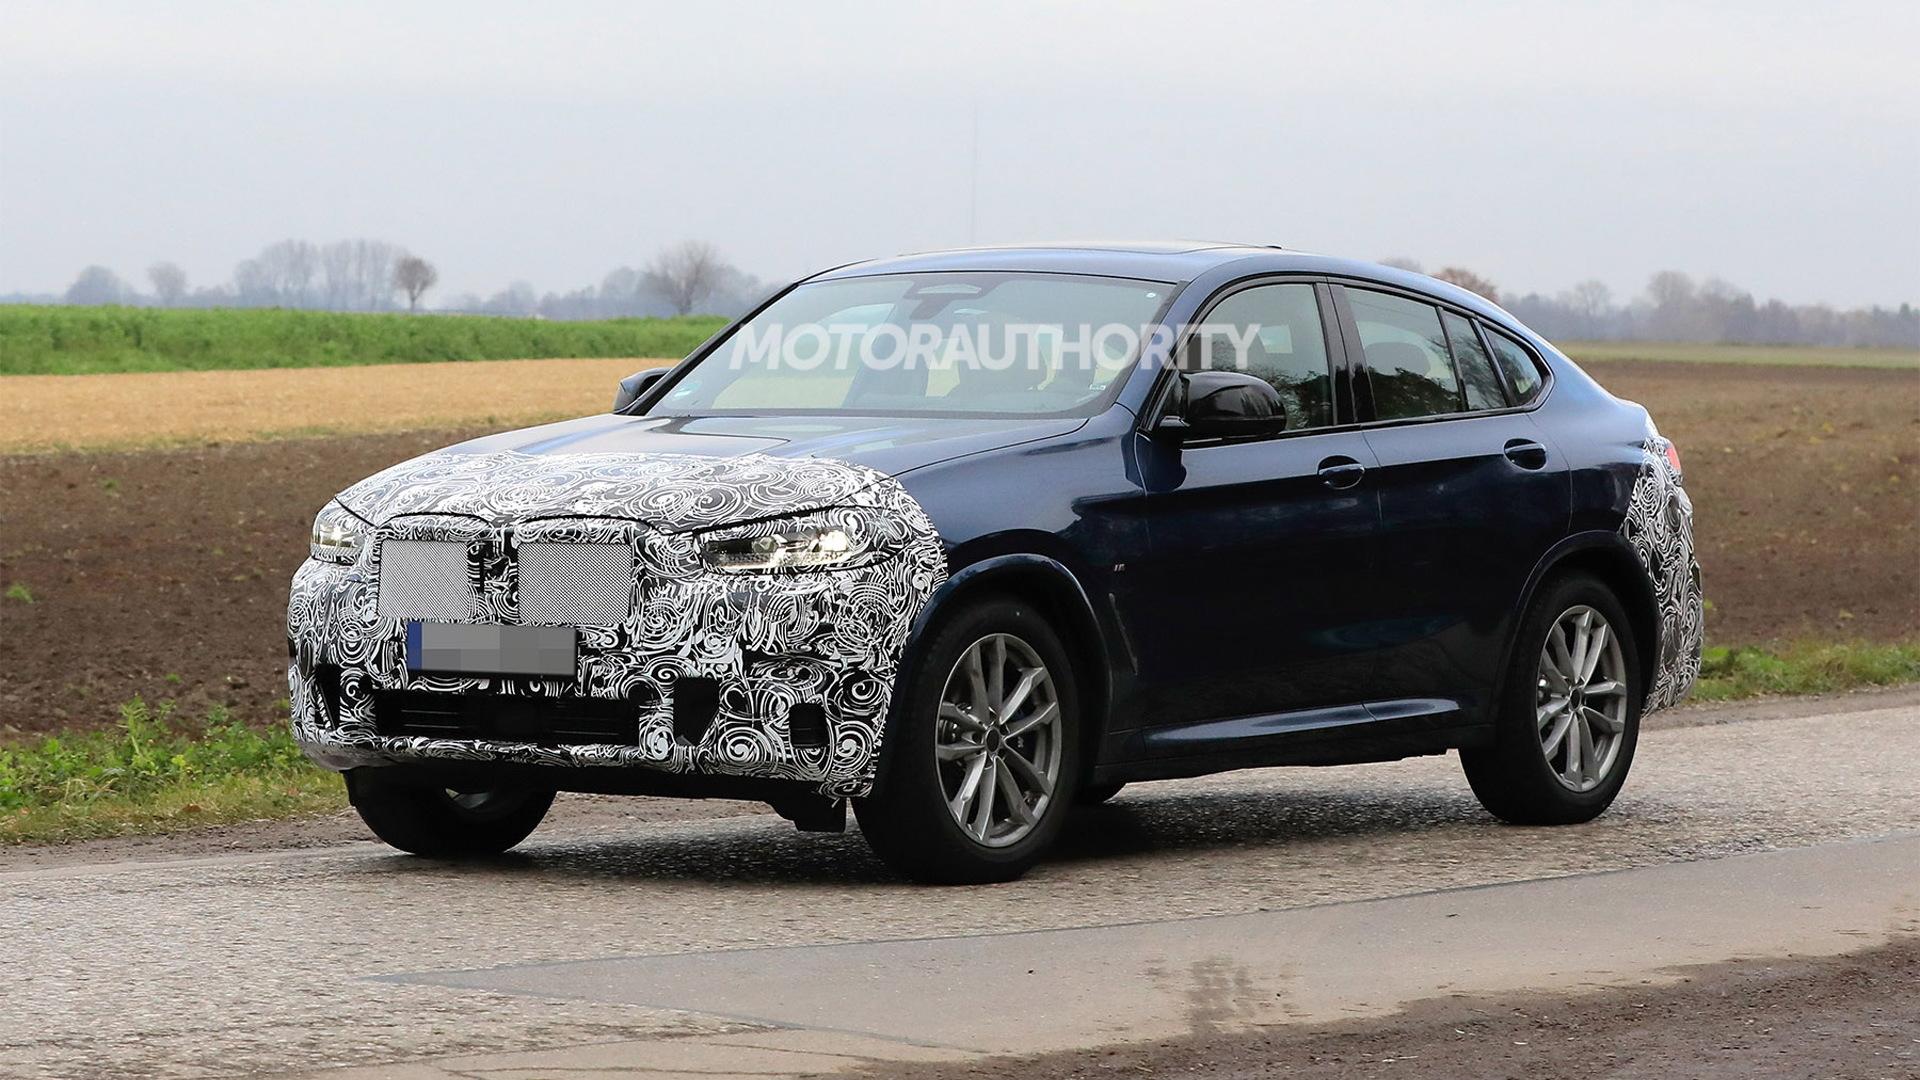 2022 BMW X4 facelift spy shots - Photo credit:S. Baldauf/SB-Medien